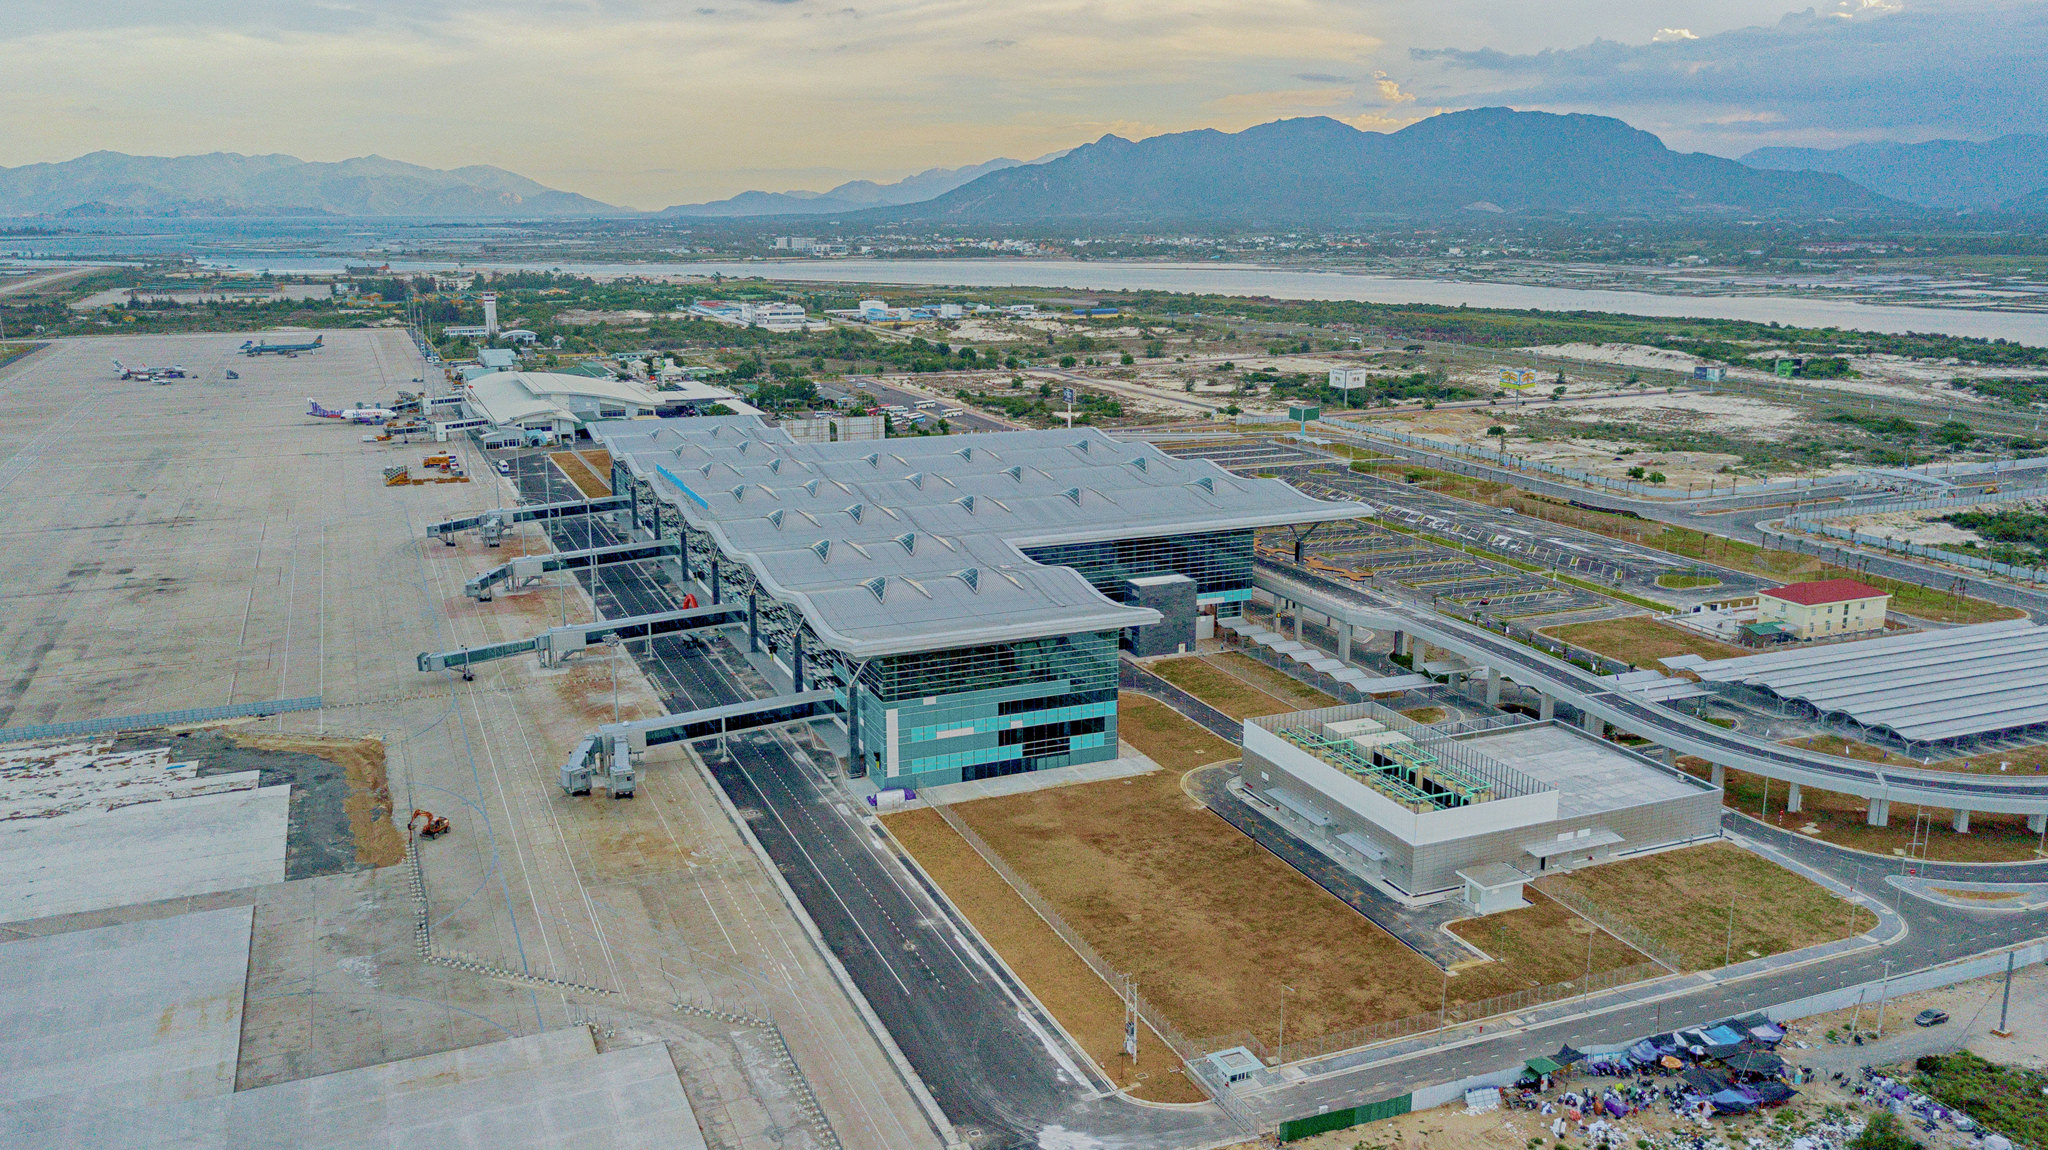 20180626 - Cam Ranh Airport - Architecture - Flycam - 0006.jpg